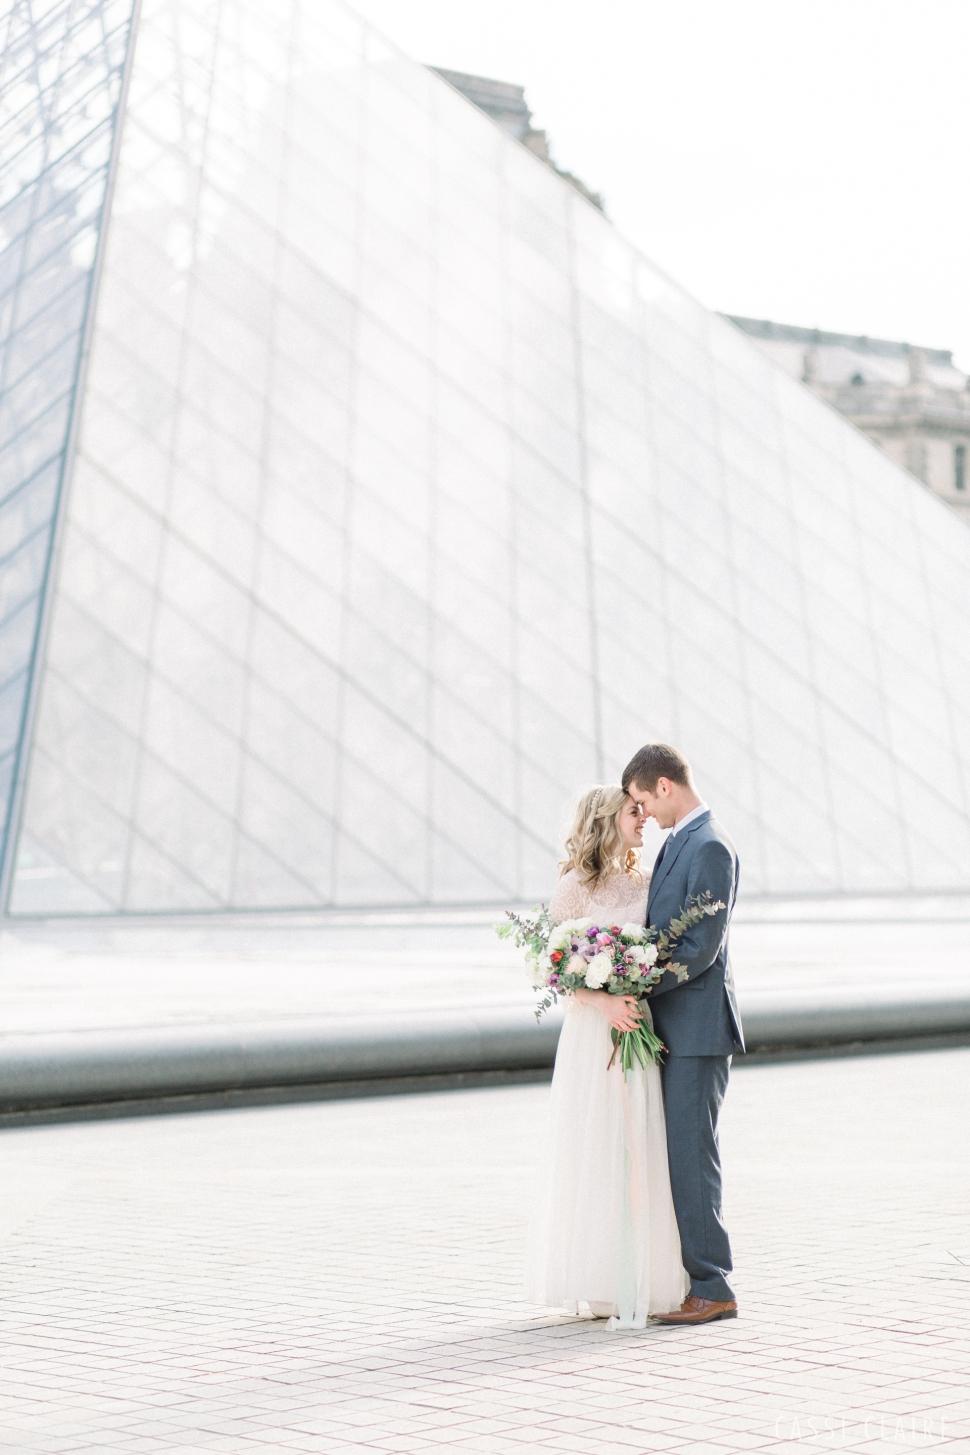 Paris-France-Wedding_CassiClaire_29.jpg